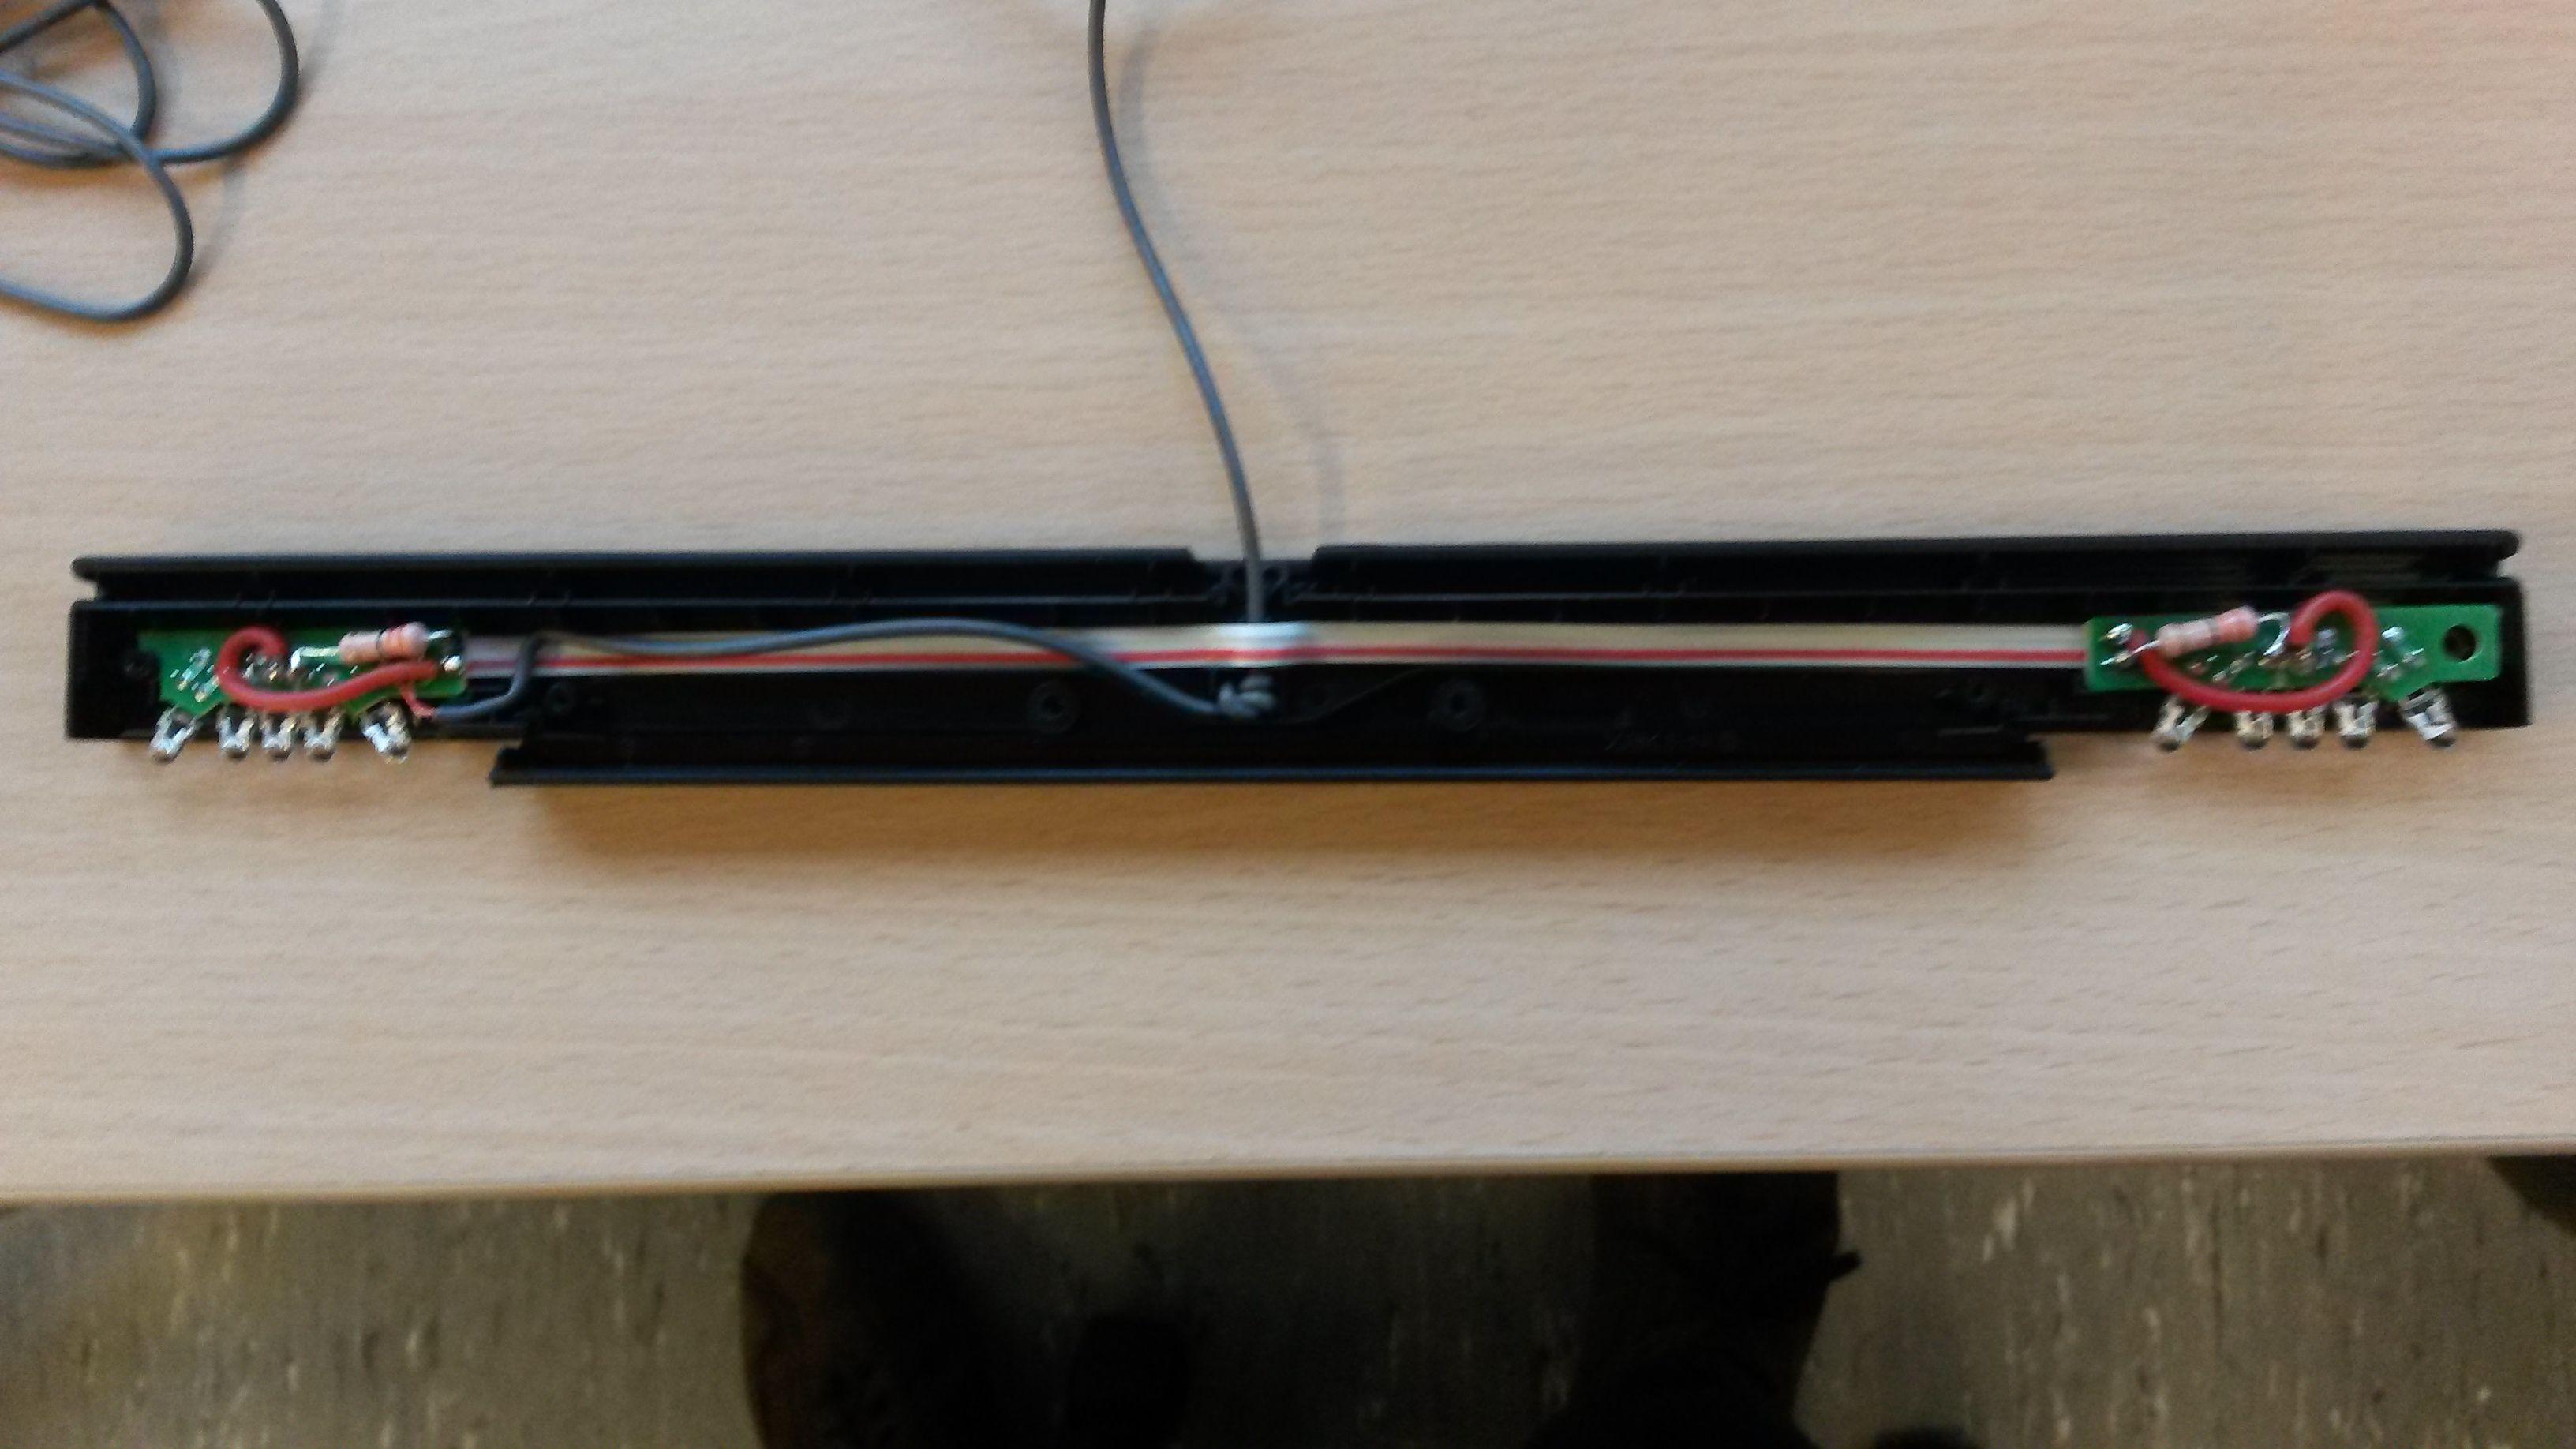 Inside Wii sensor bar   Retro video games, Retro videos, Earbuds   Wii Sensor Bar Wire Diagrams      Pinterest